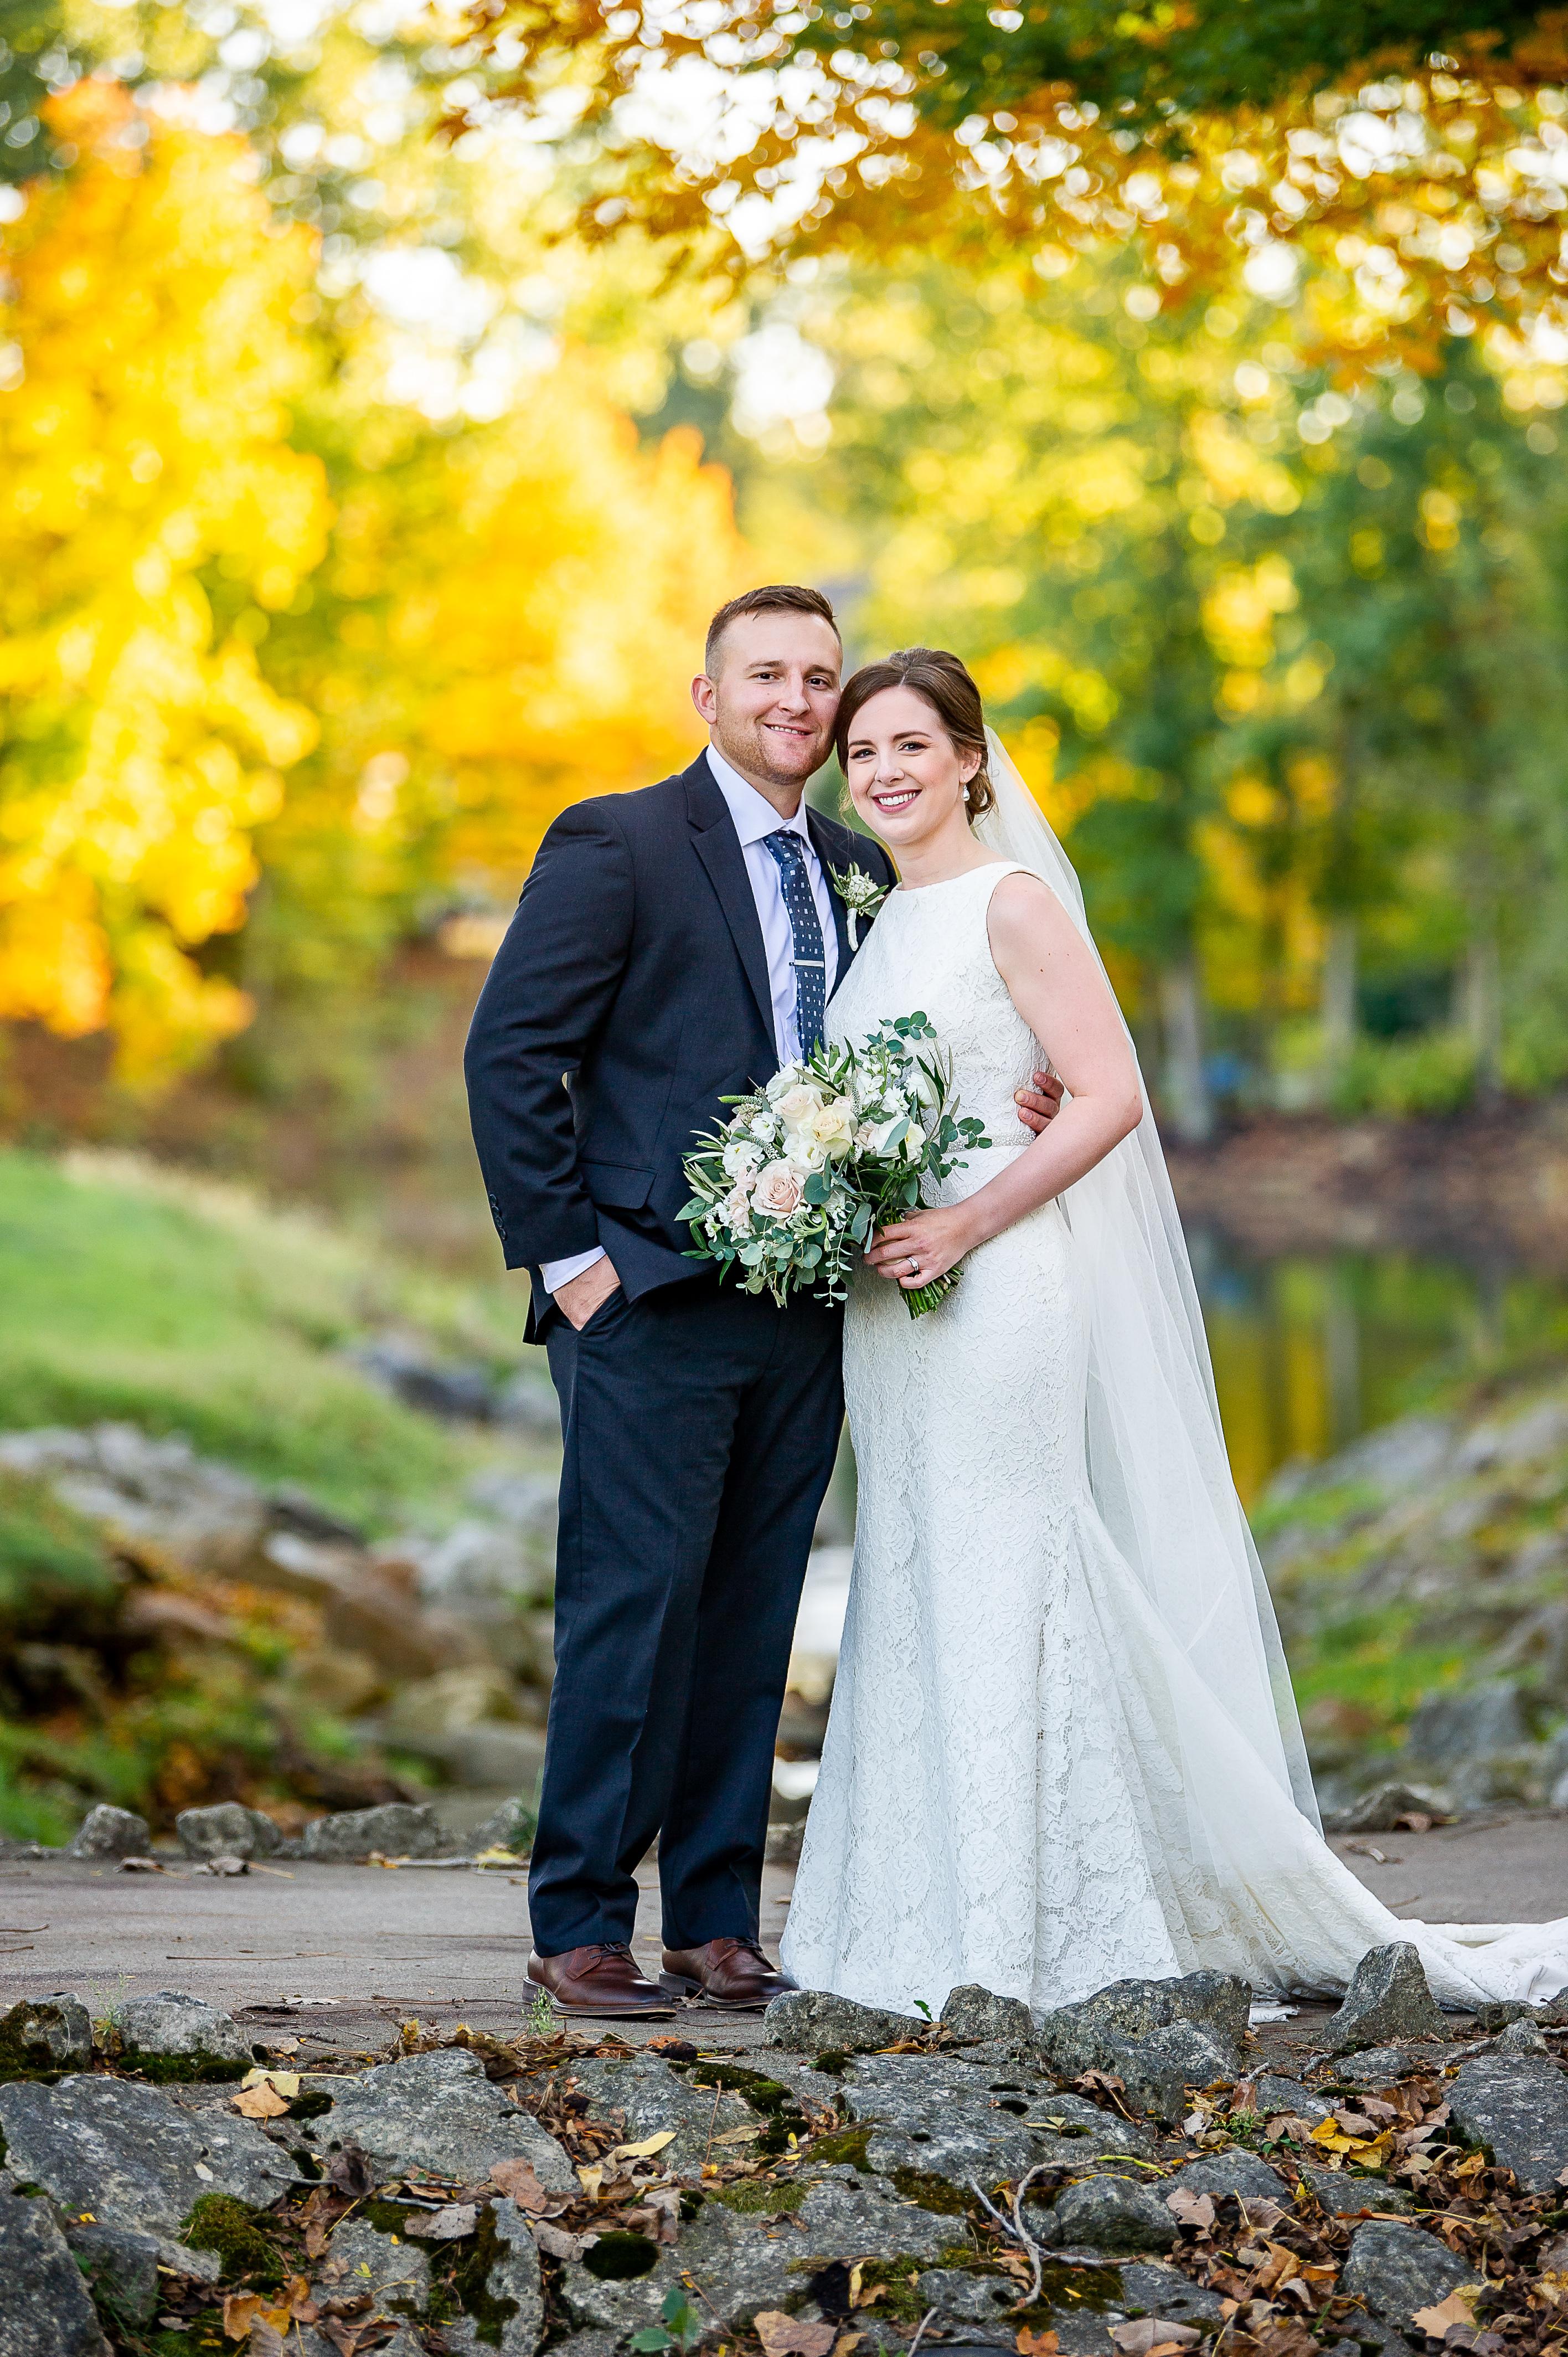 Zach & Chelsea's Wedding Reception